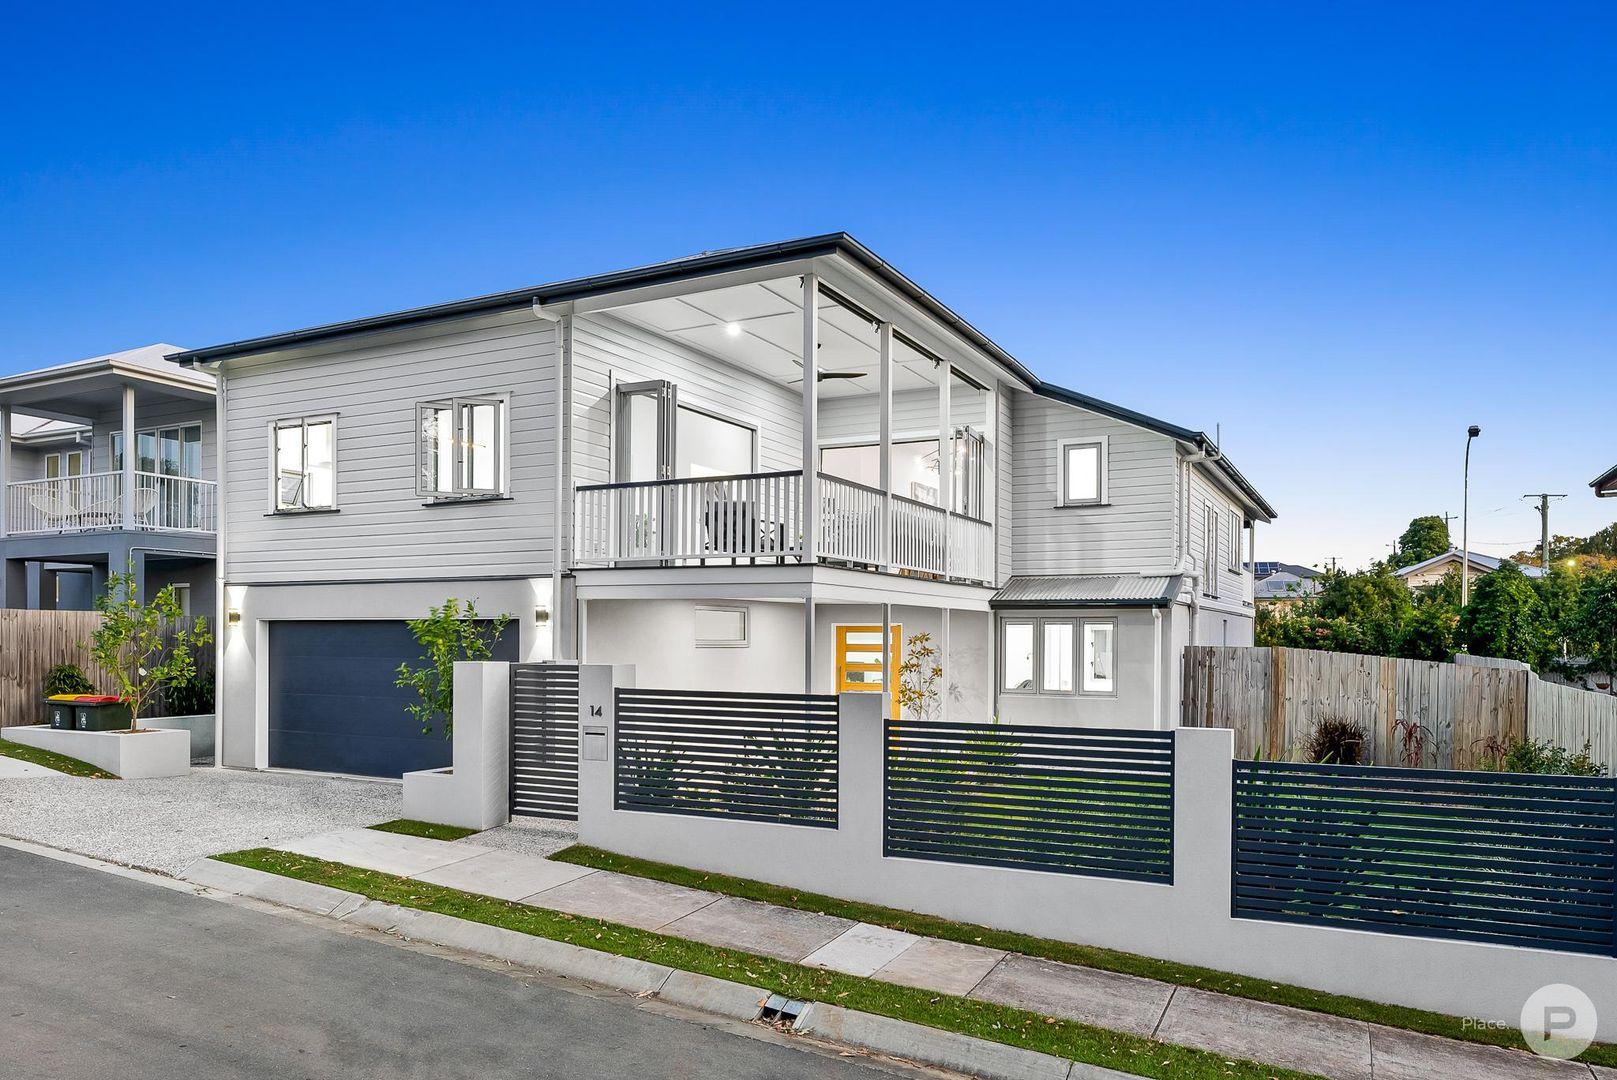 14 Brevis Lane, Enoggera QLD 4051, Image 1